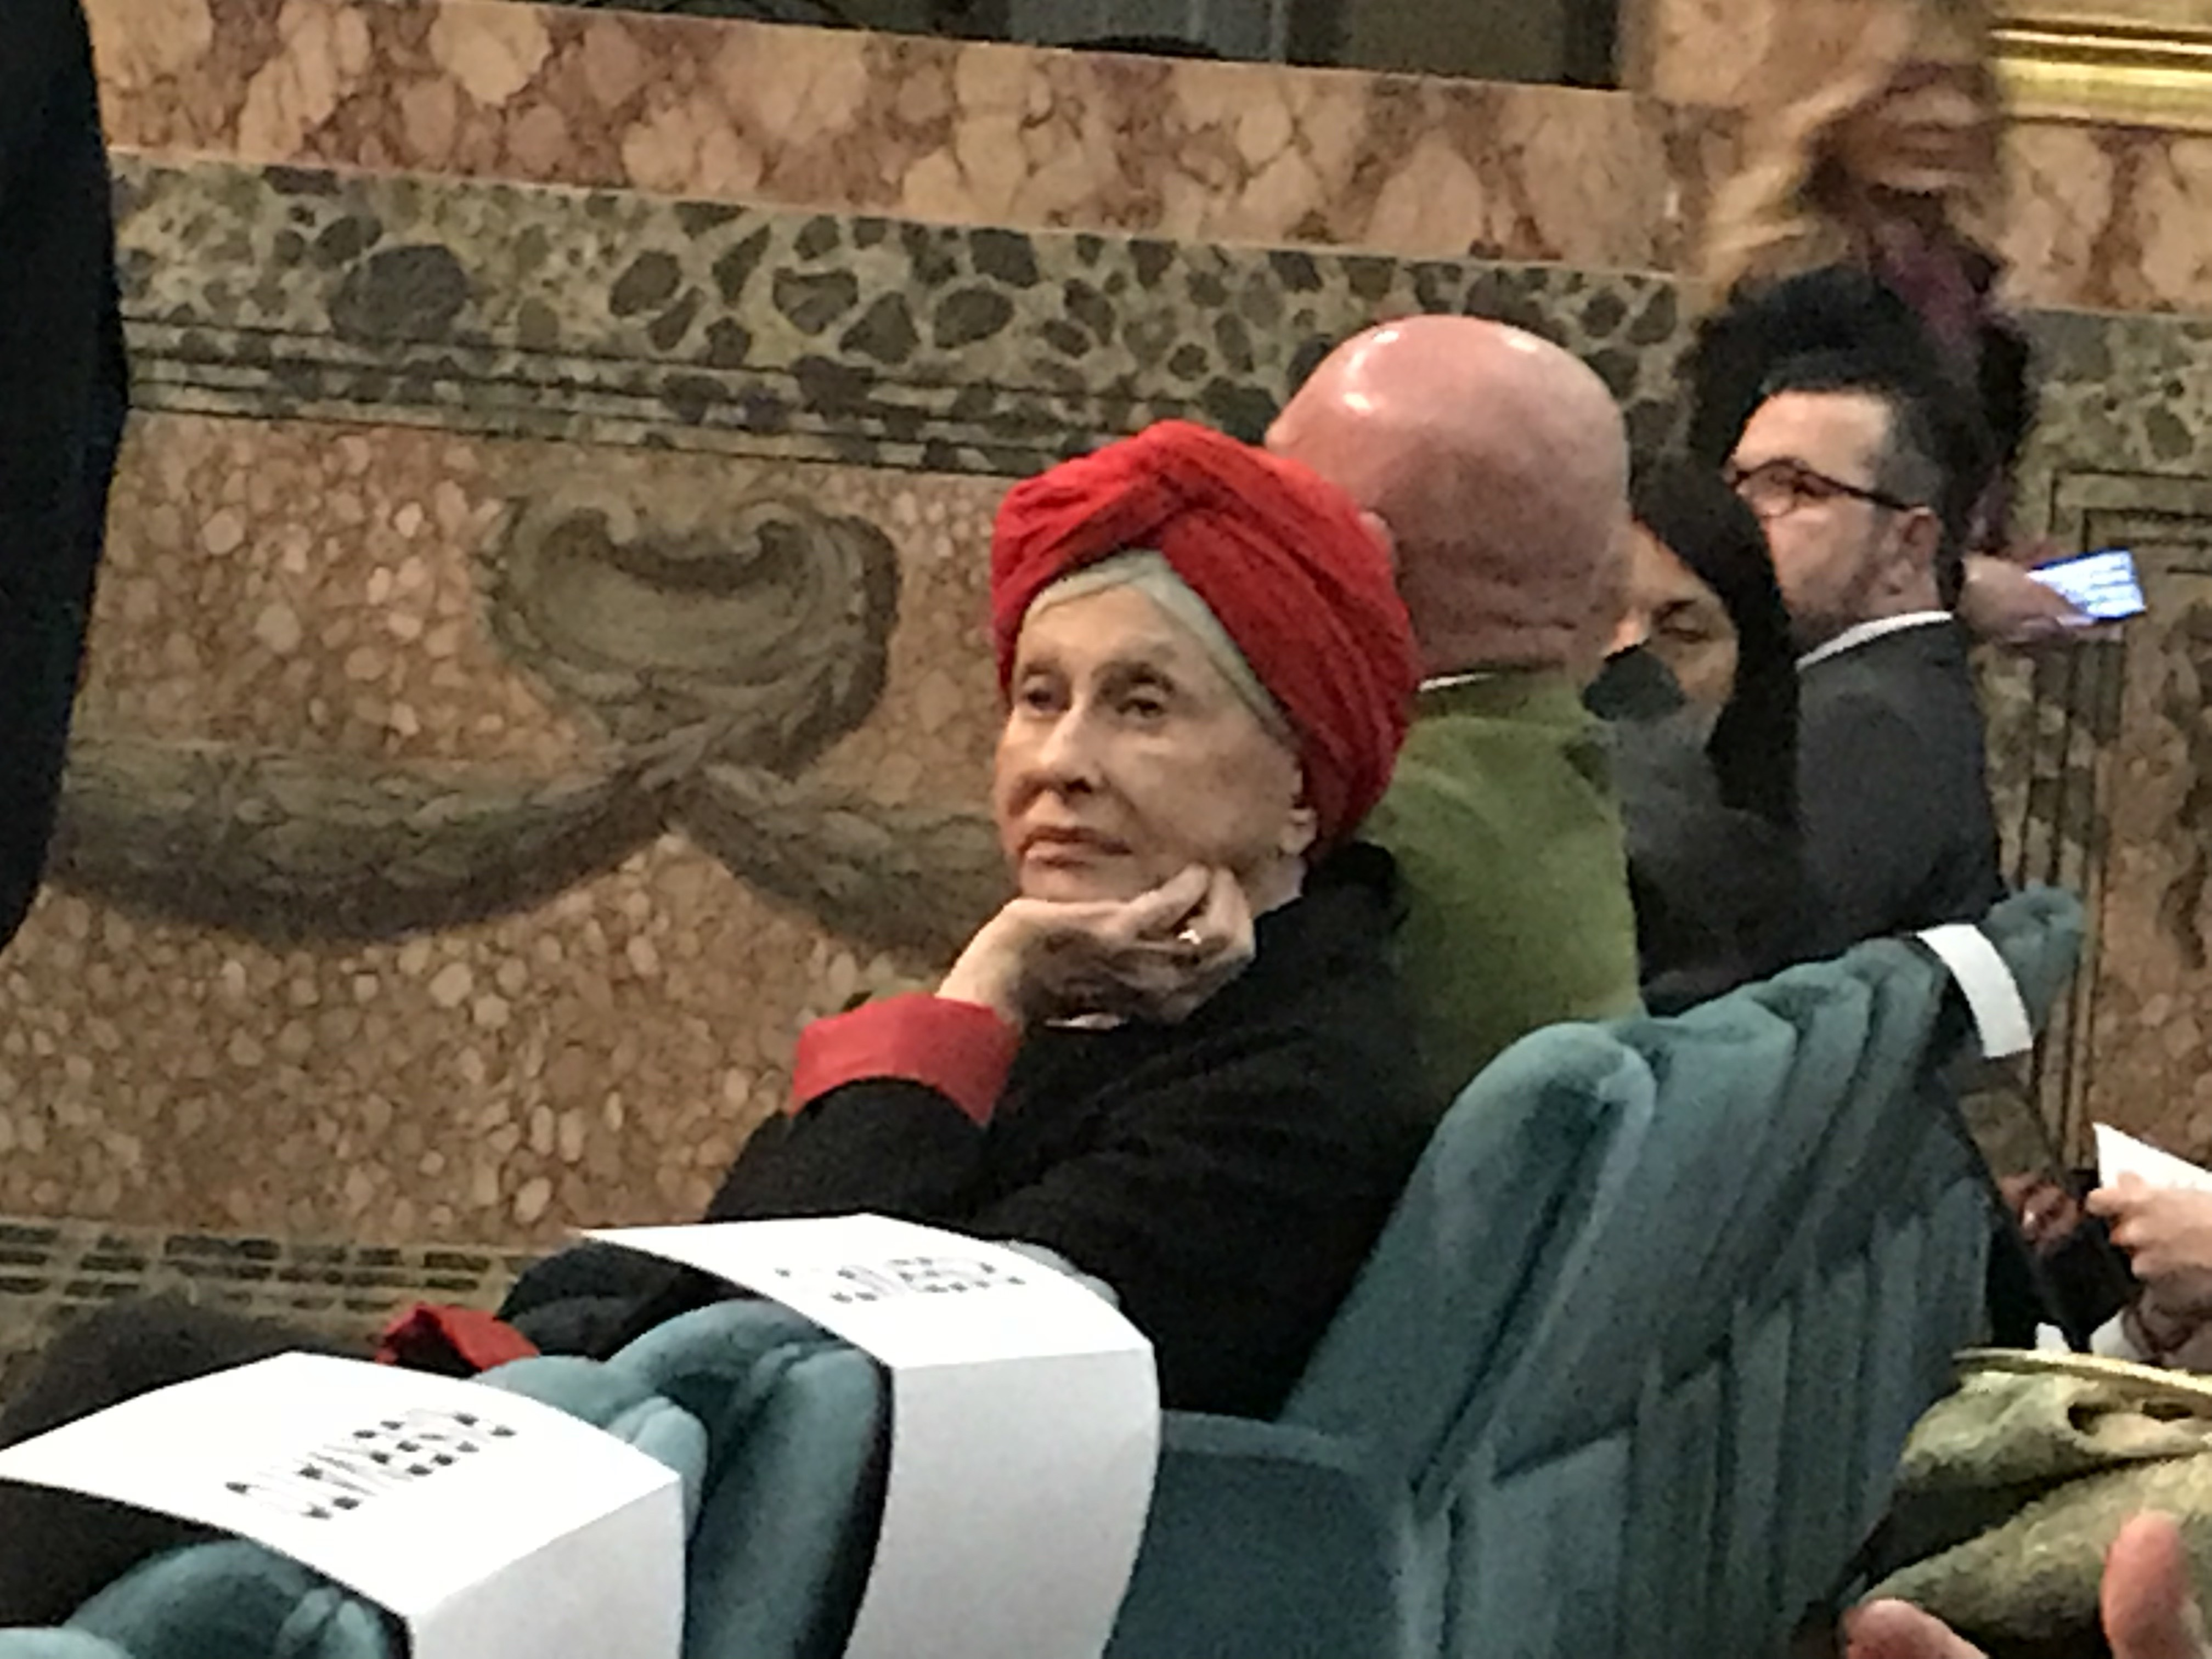 The Shock of the Not Quite New: La Pittura dopo il Postmodernismo ...